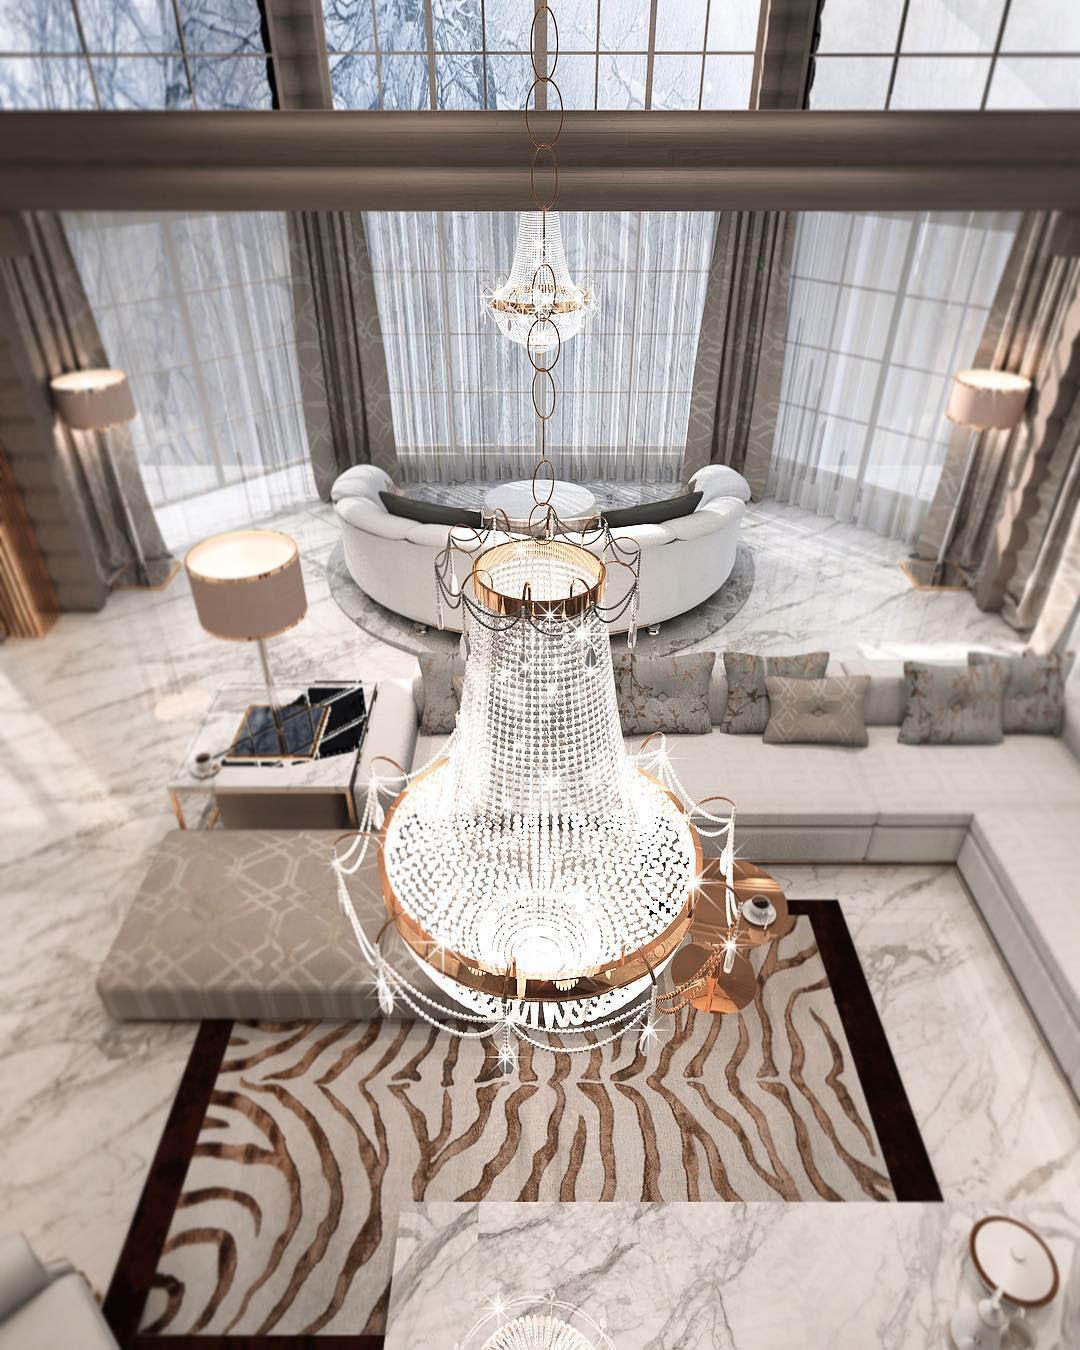 Constantin Frolov Interior Design | Luxurious Residential Interiors